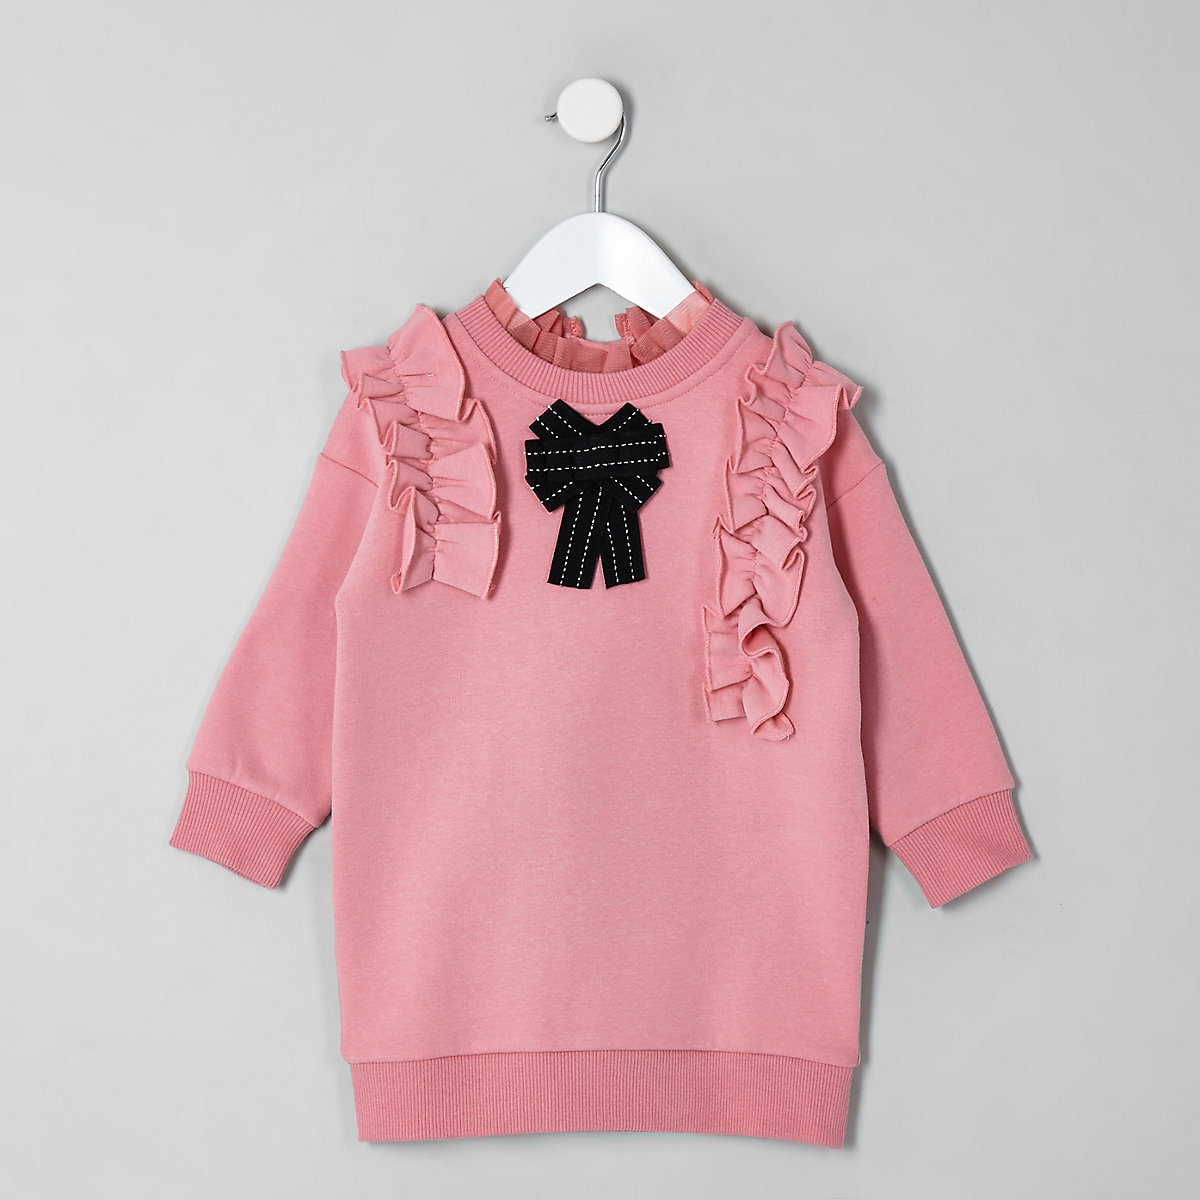 Mini girls pink bow sweater dress